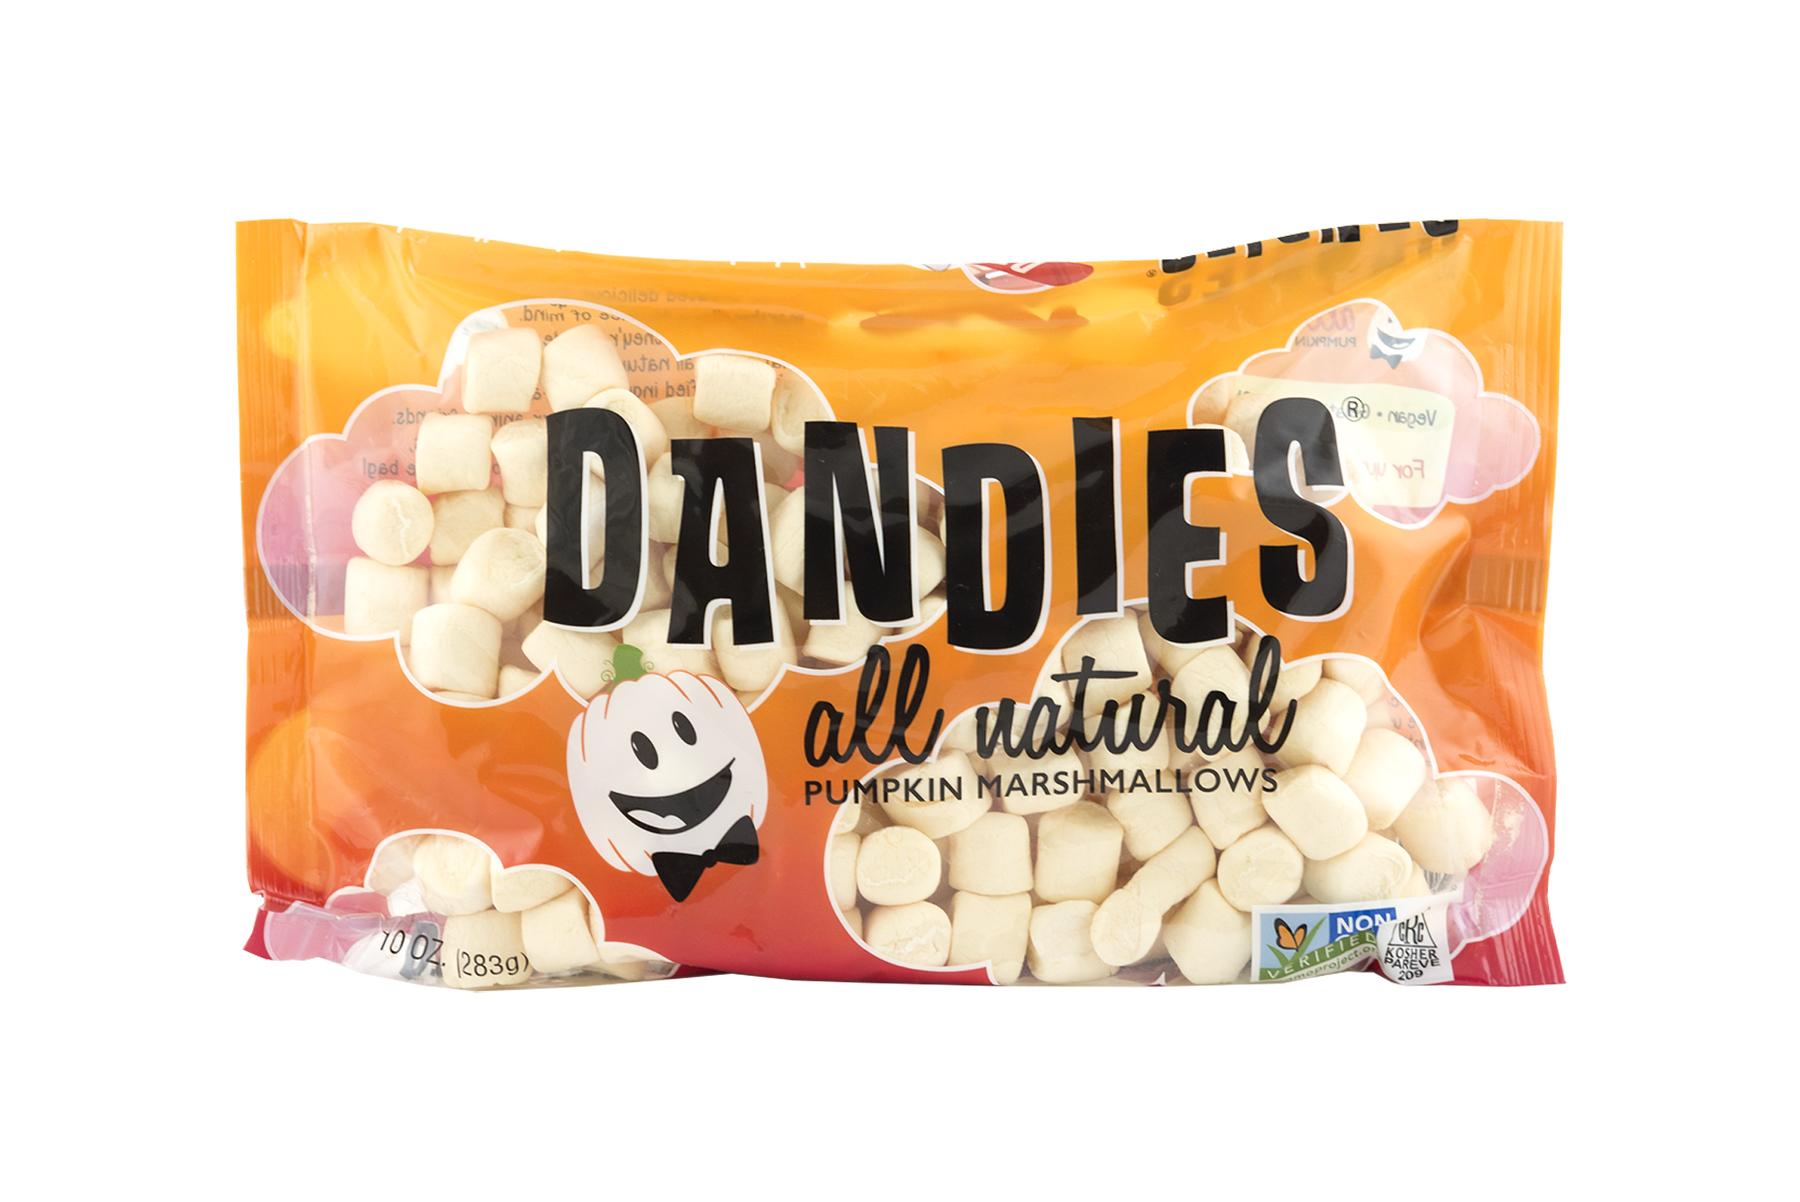 dandies-pumpkin-marshmallows-front-300dpi.jpg